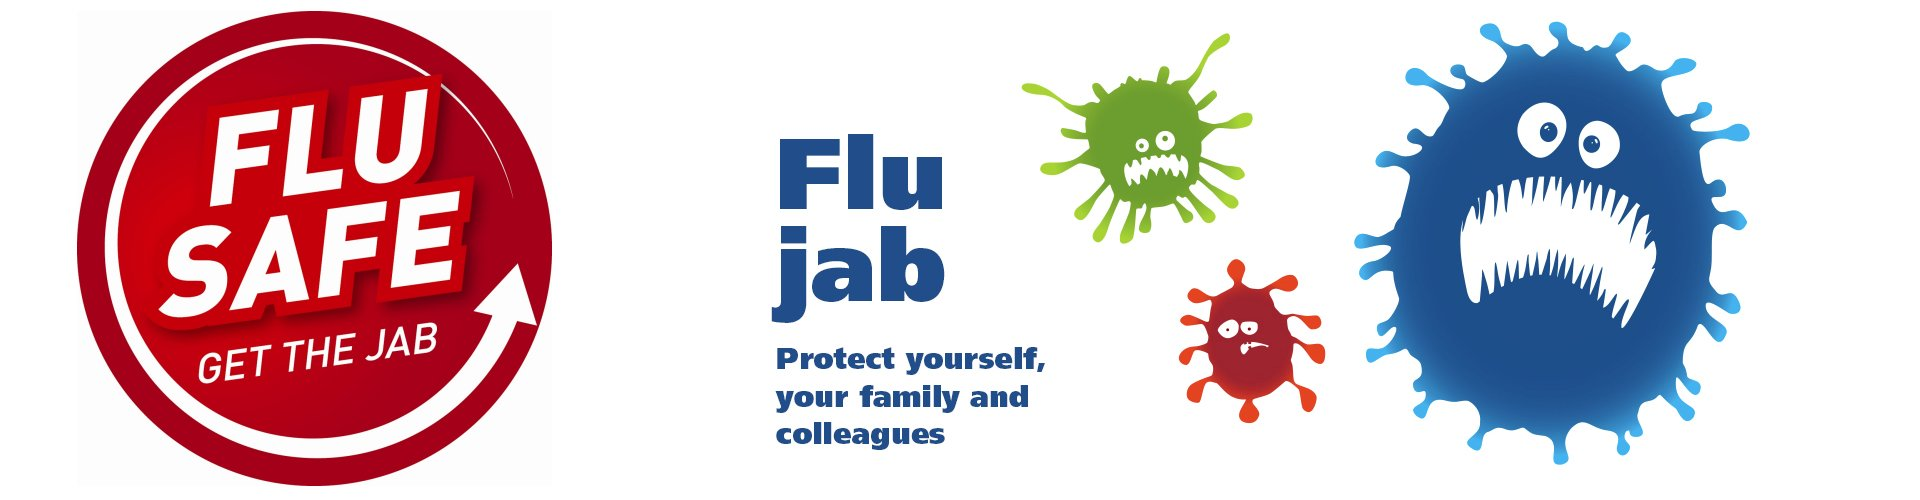 flu jab - photo #26